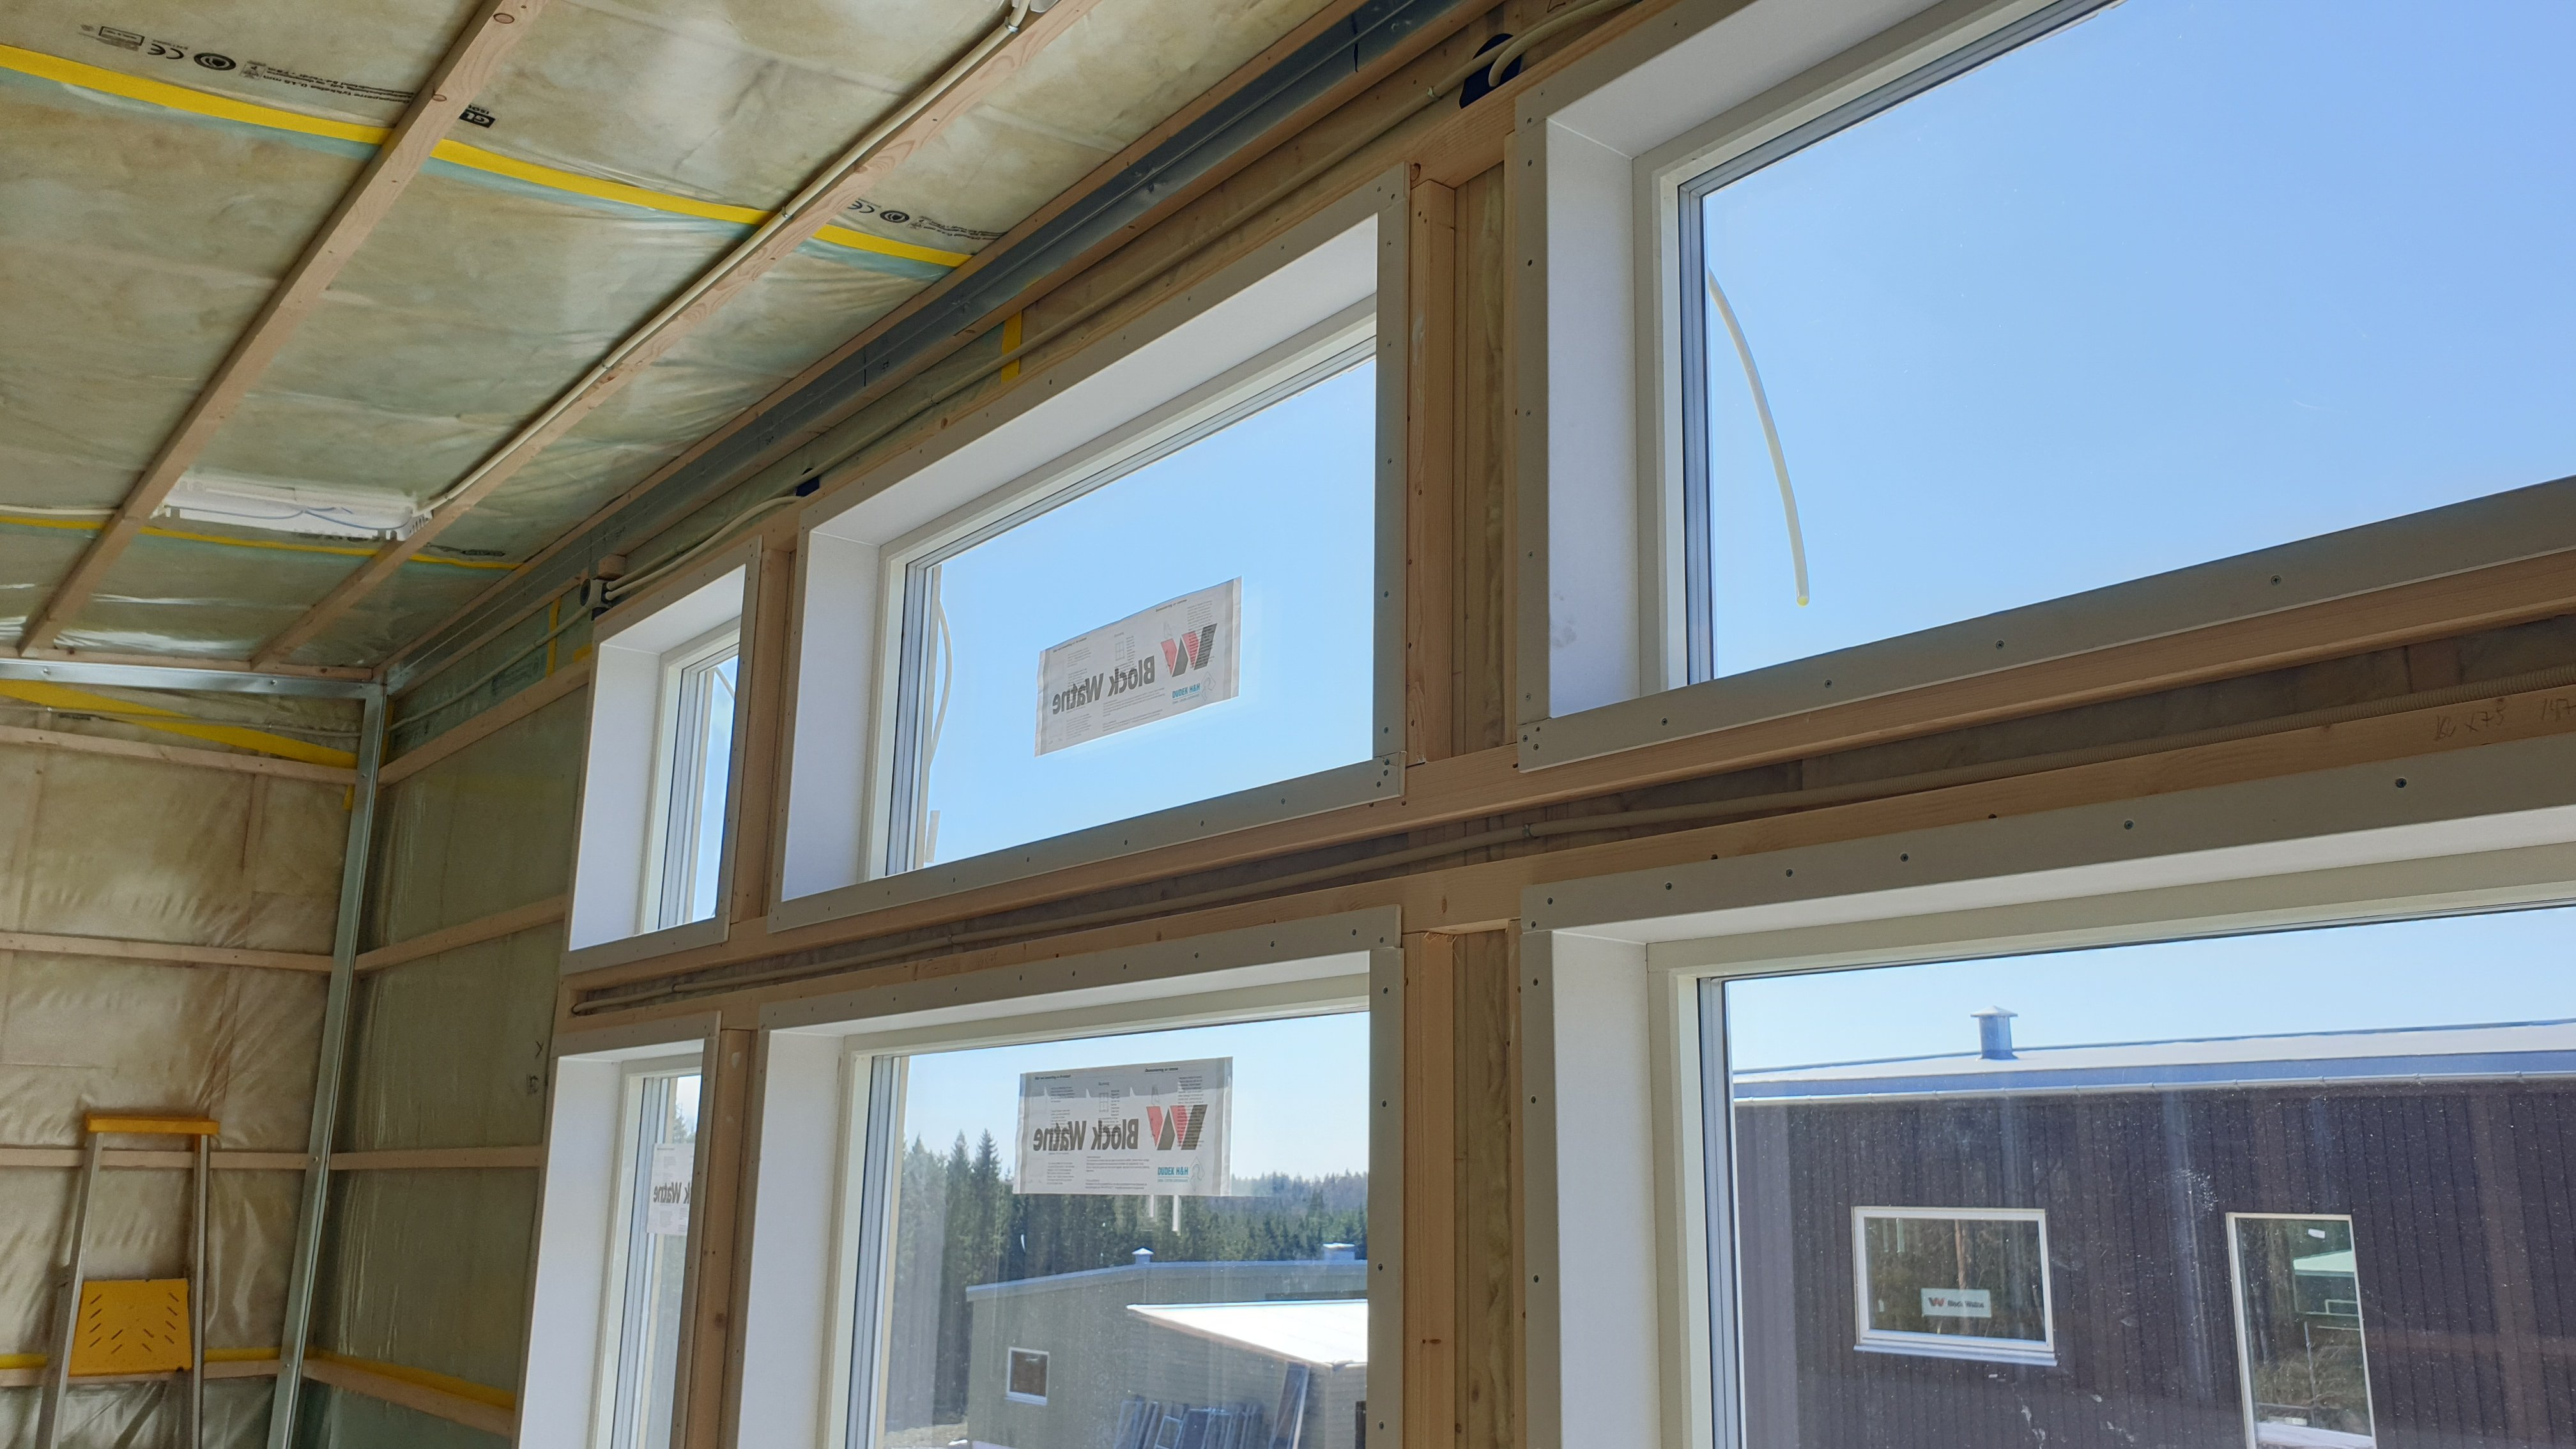 Smyplater montert i vindusspor